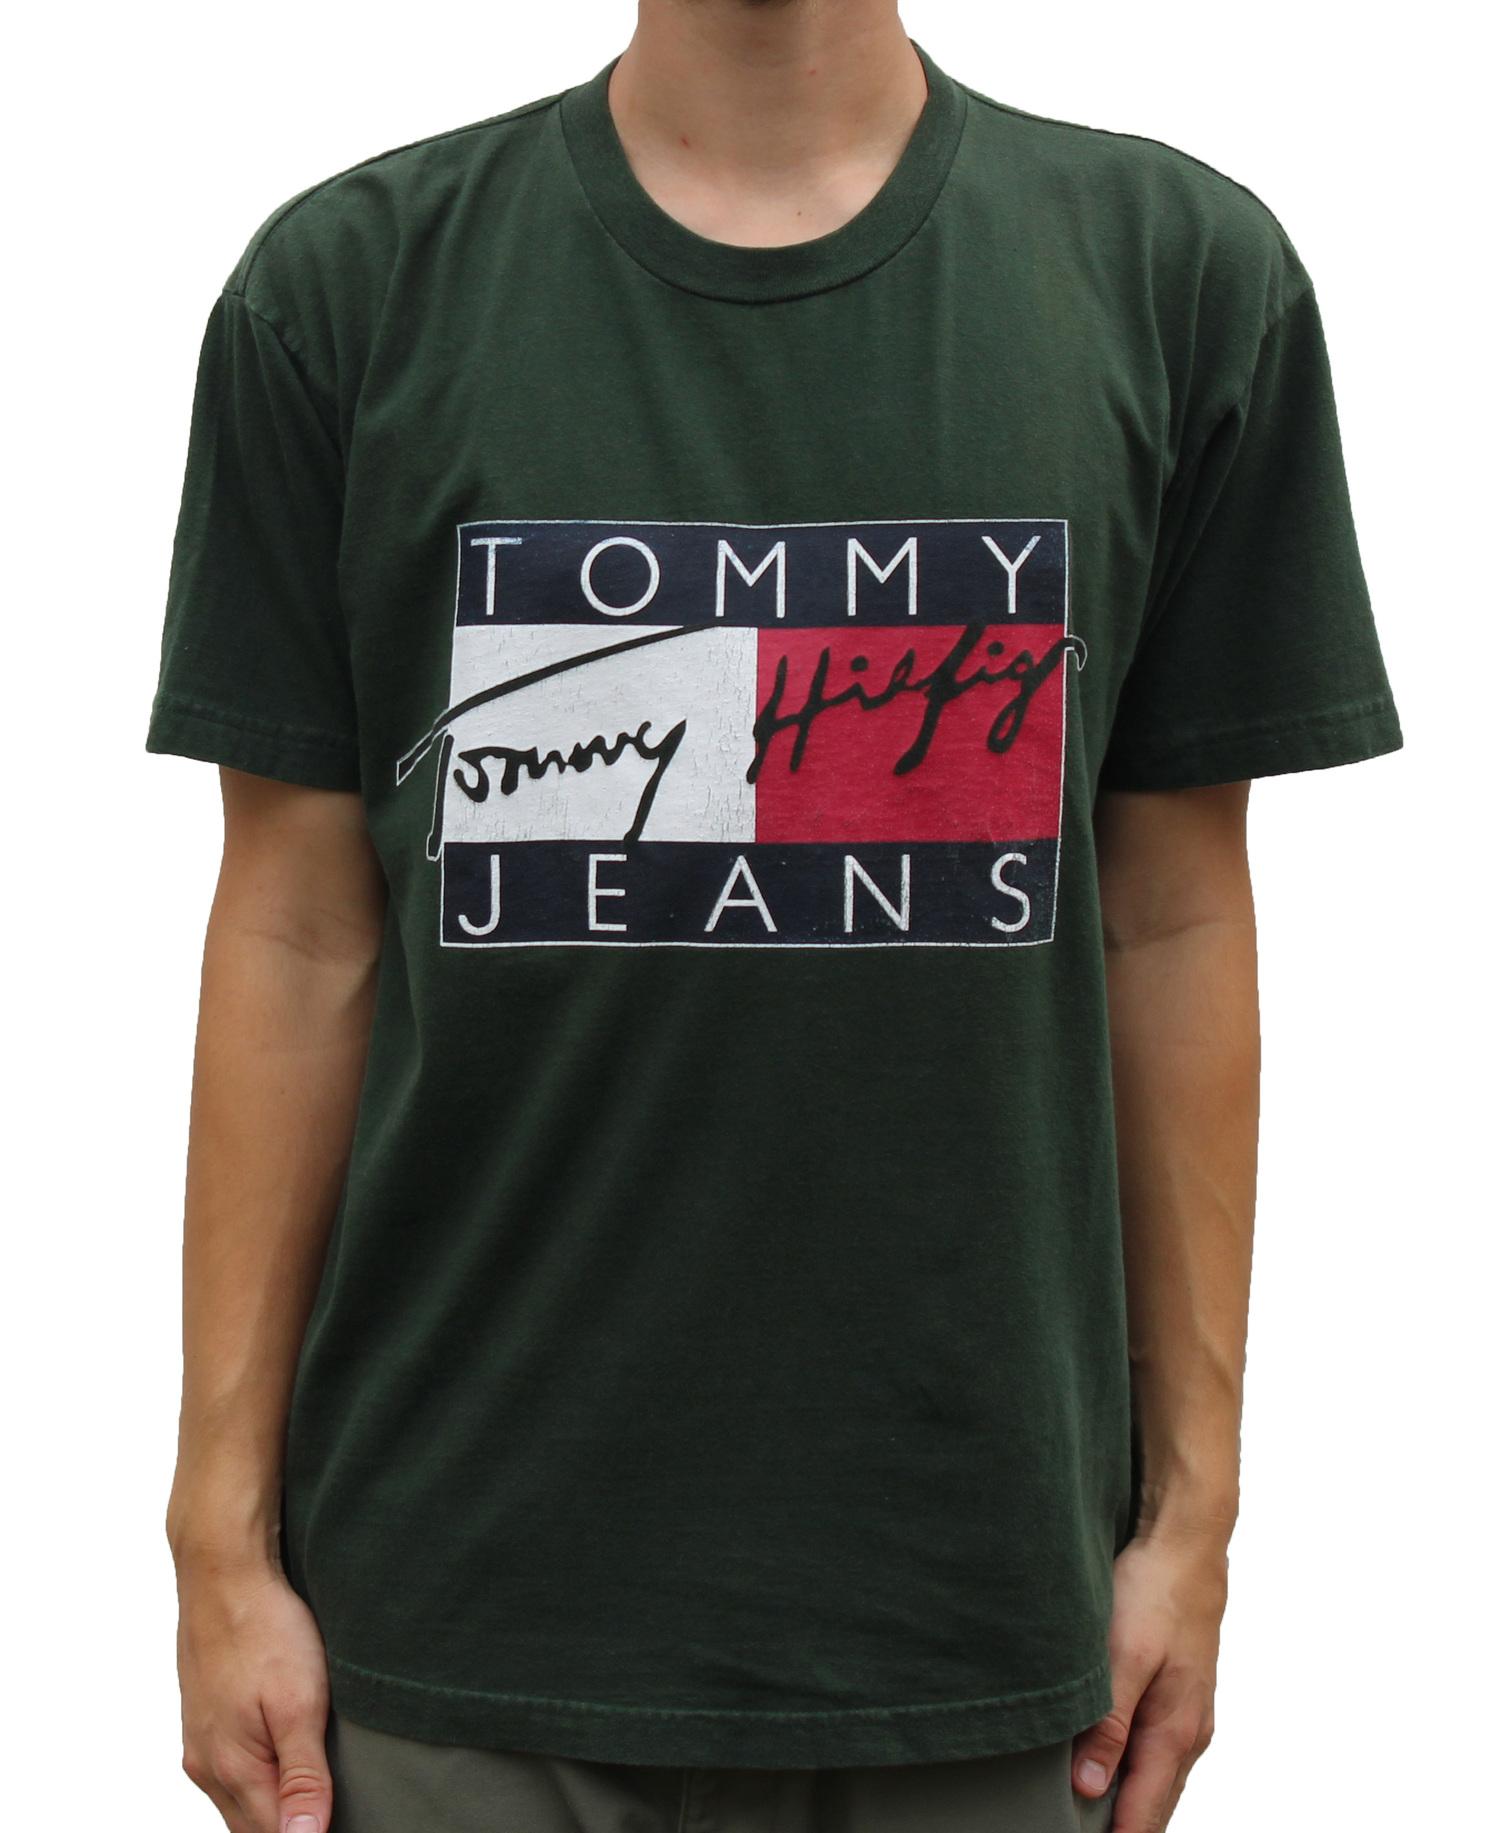 804be643 Tommy Jeans 90s Vintage Logo Sweatshirt